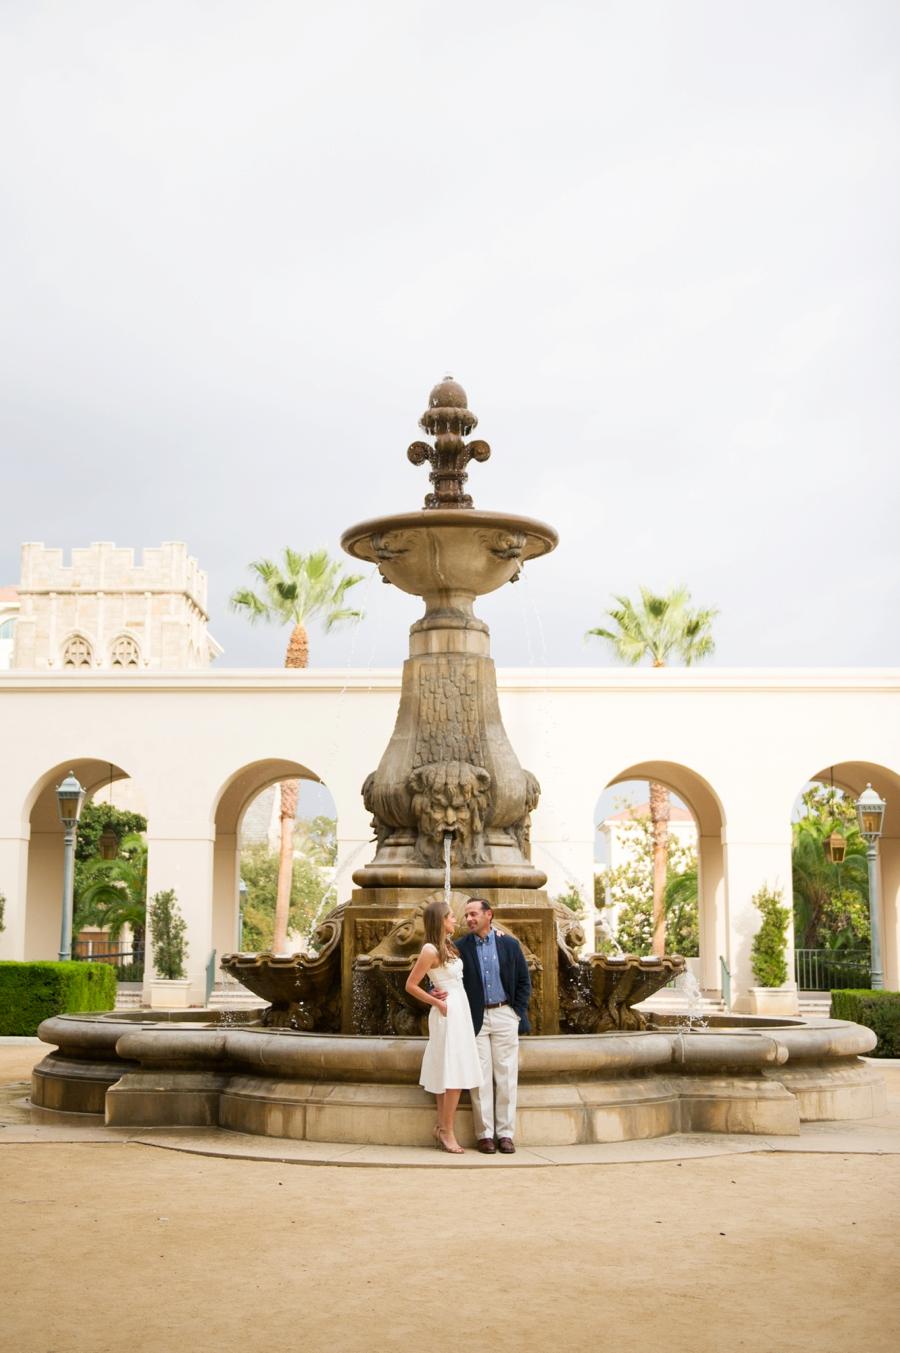 Pasadena_City_Hall_Engagement_Photos_JC_07.jpg